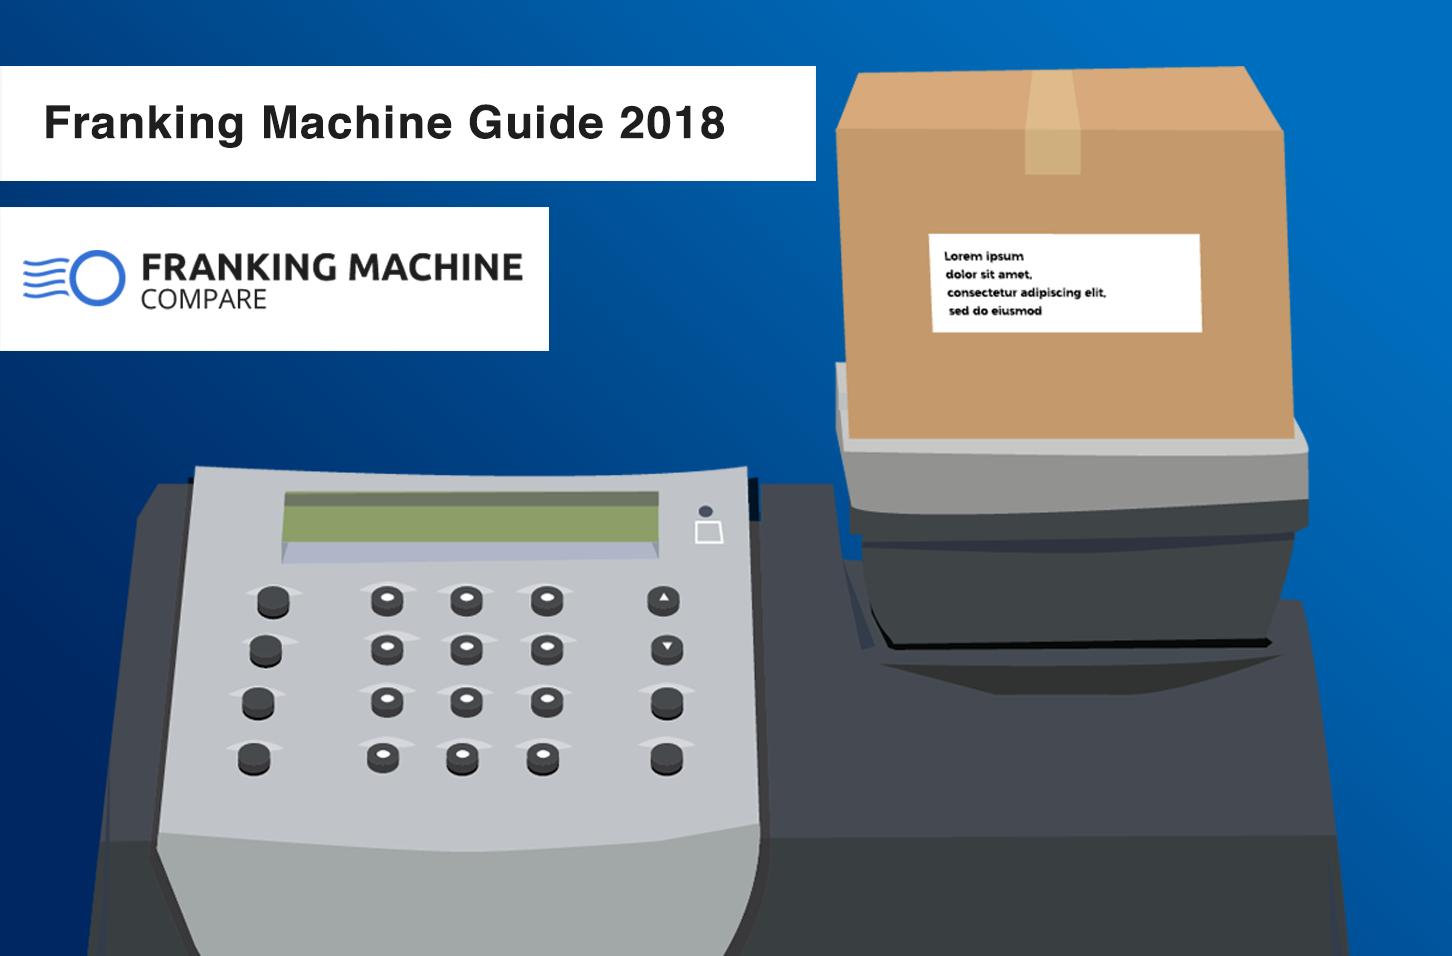 franking machine guide 2018